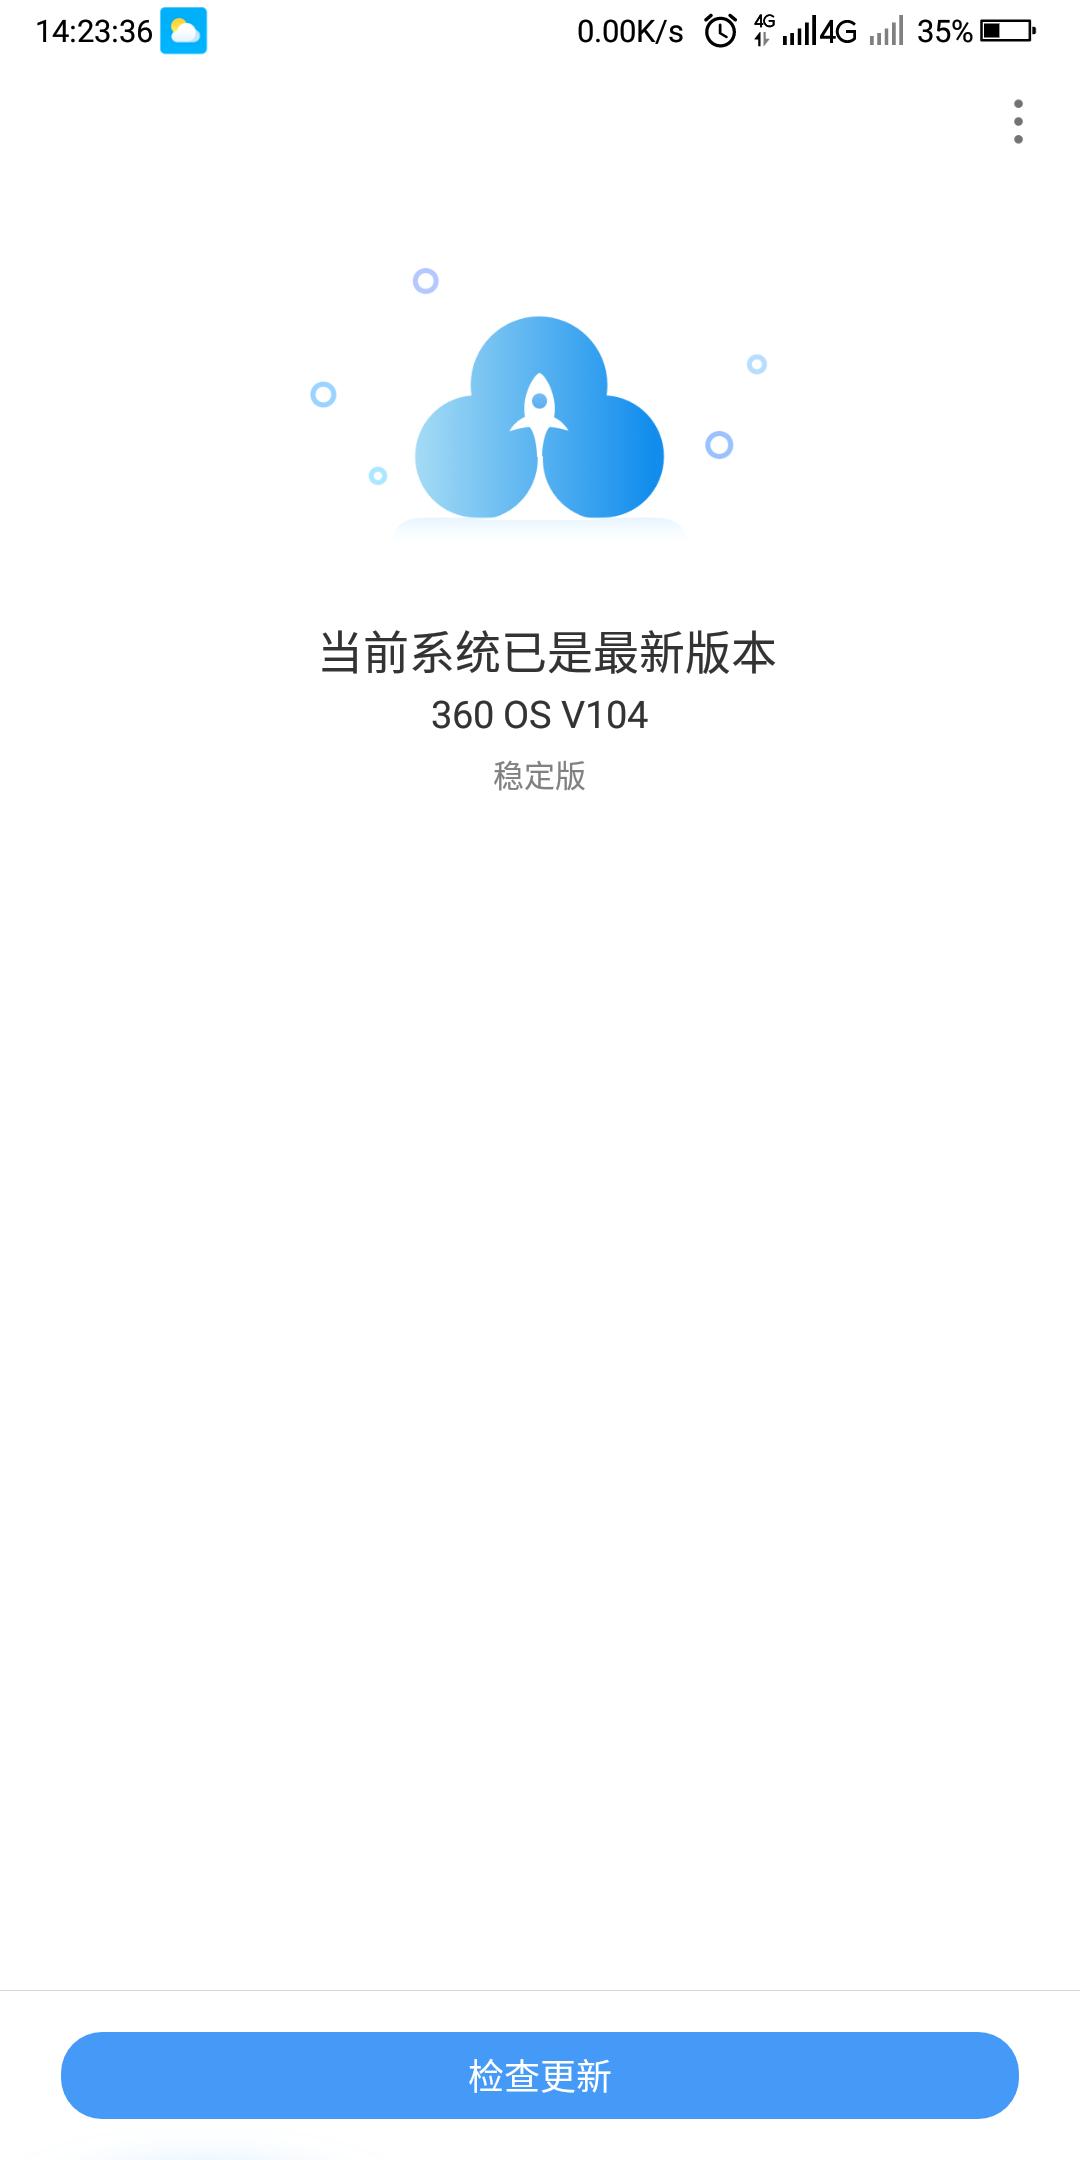 Screenshot_2018-10-27-14-23-38.png